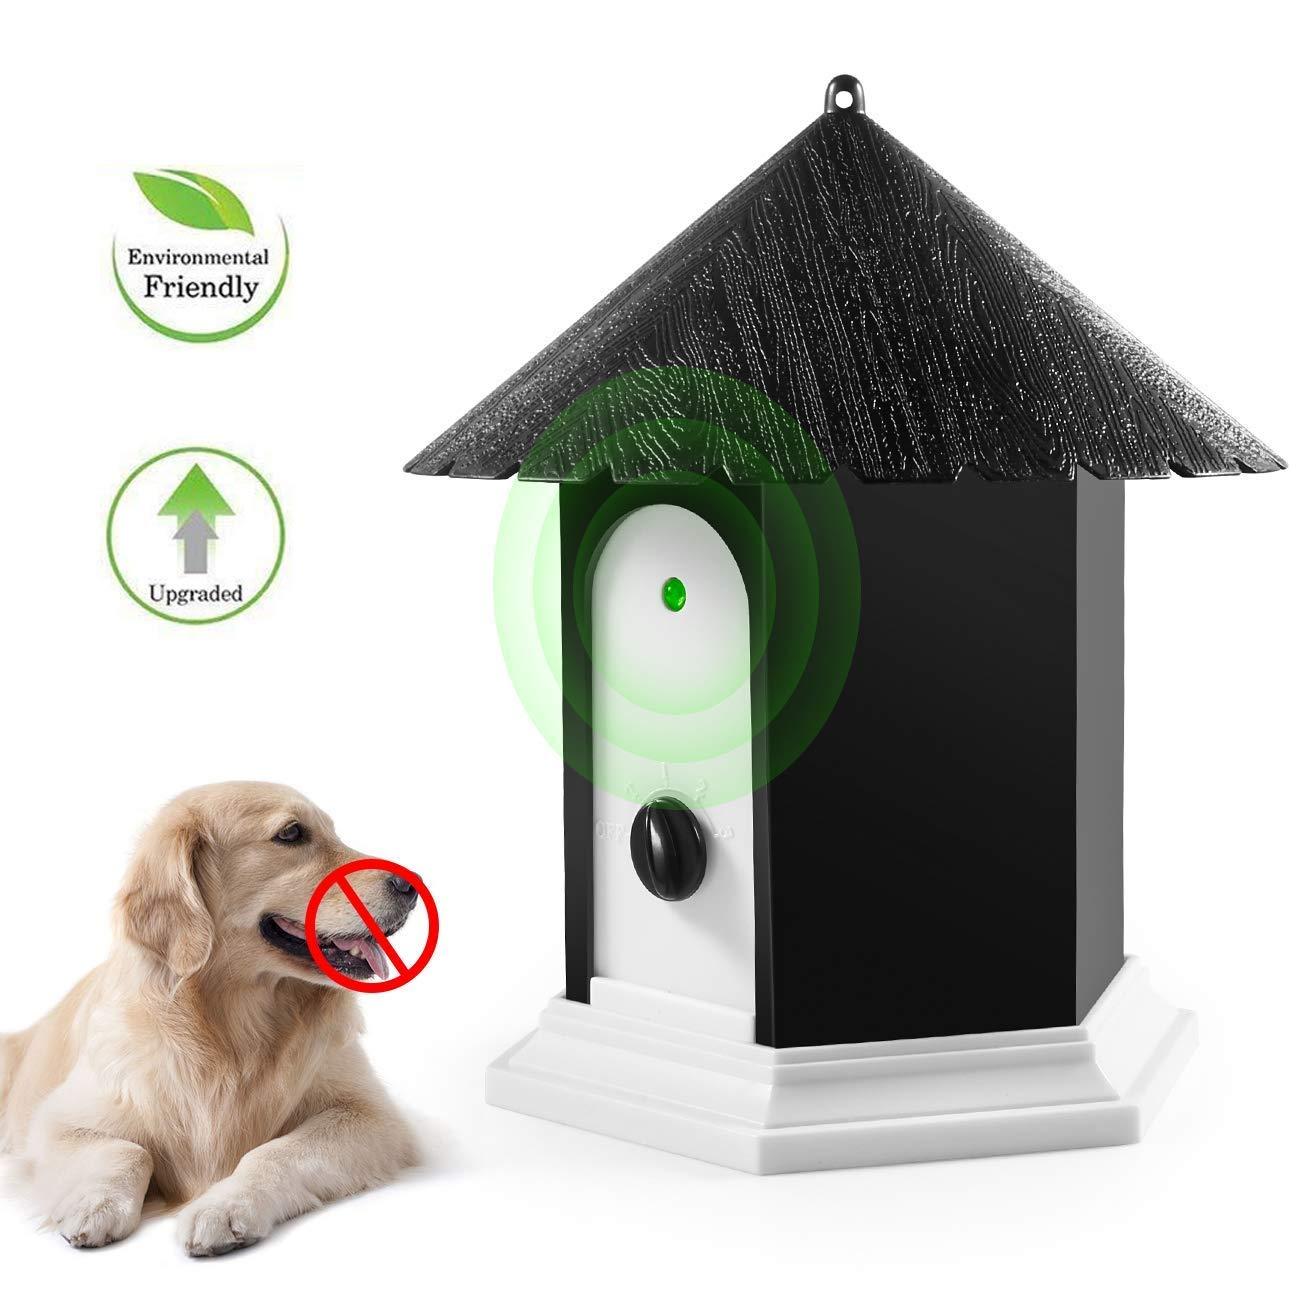 Anti Barking Device, Bark Box Dog Barking Control Devices, Ultrasonic Sonic Dog Repellent Anti Bark Deterrents Devices, Bark Control Device, Birdhouse Barking Deterrent, Dog Repellent, Bark Control by Ankuwa